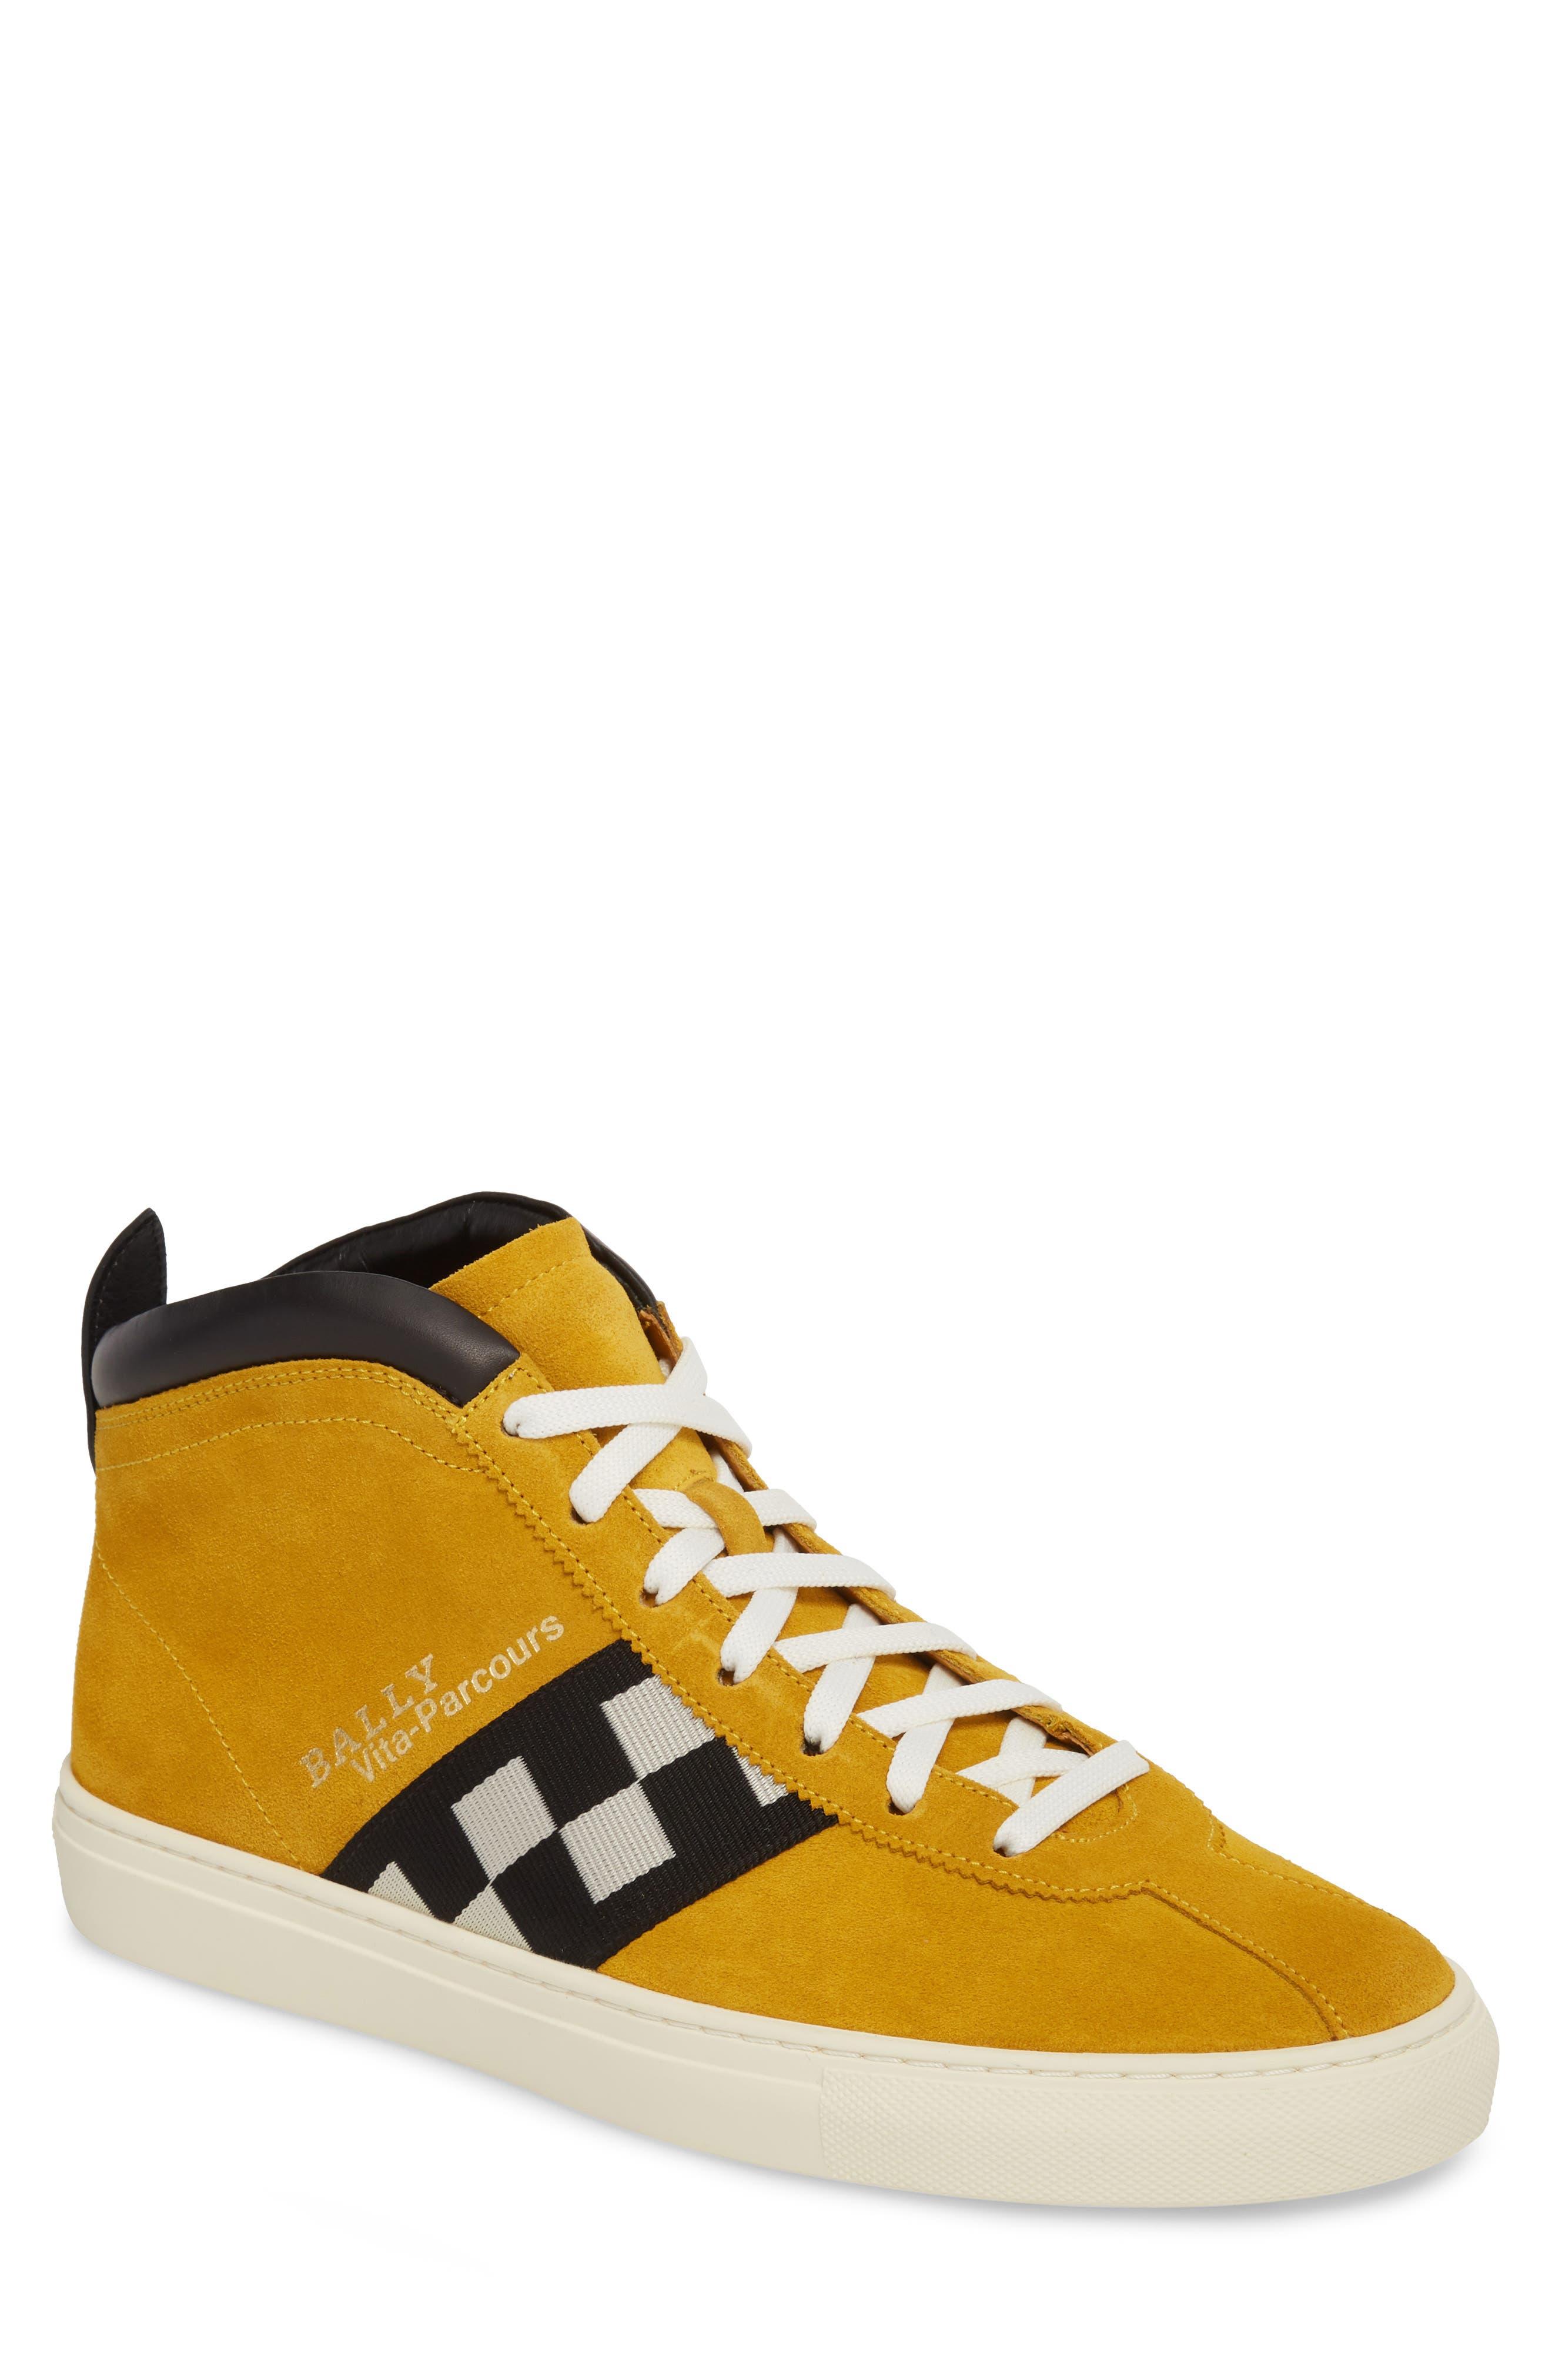 Alternate Image 1 Selected - Bally Vita Checkered High Top Sneaker (Men)